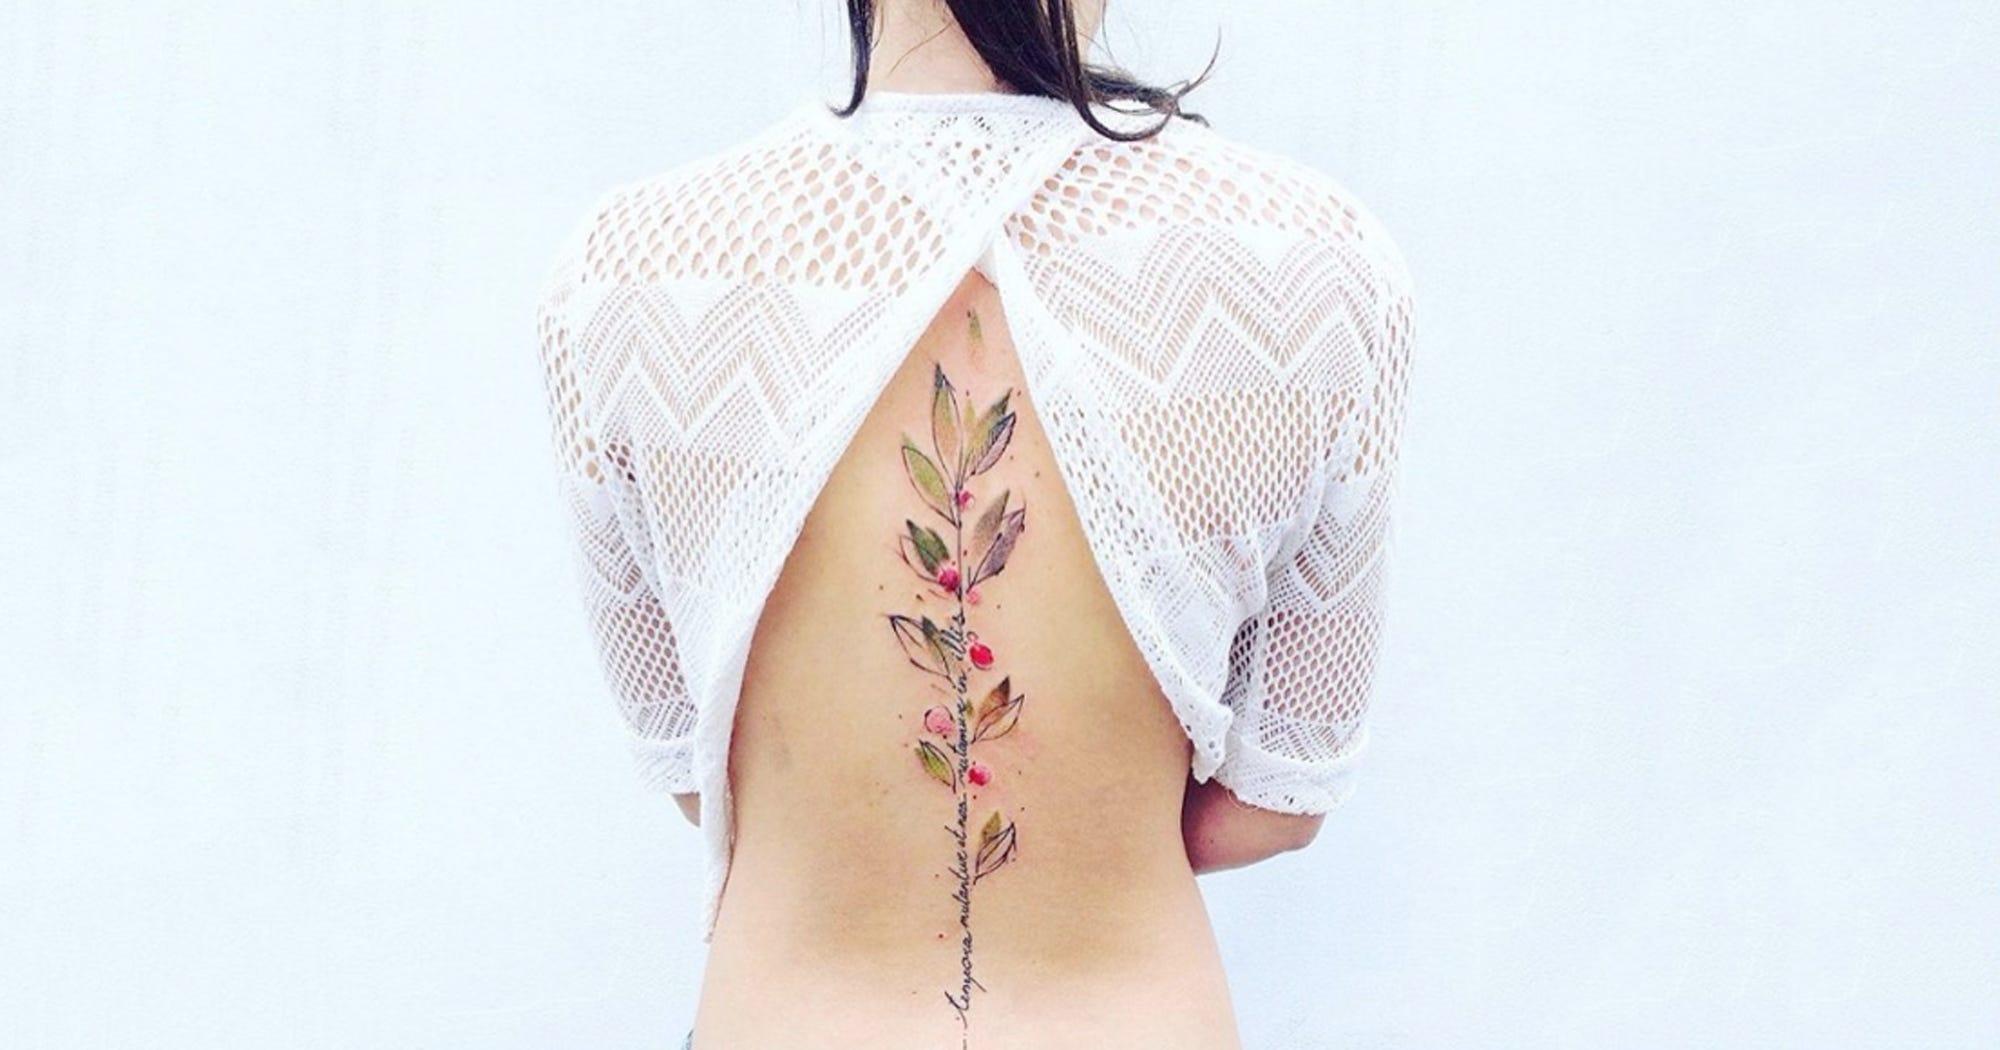 e5e2ea451 Watercolor Tattoos That Are Perfect For Spring Designs